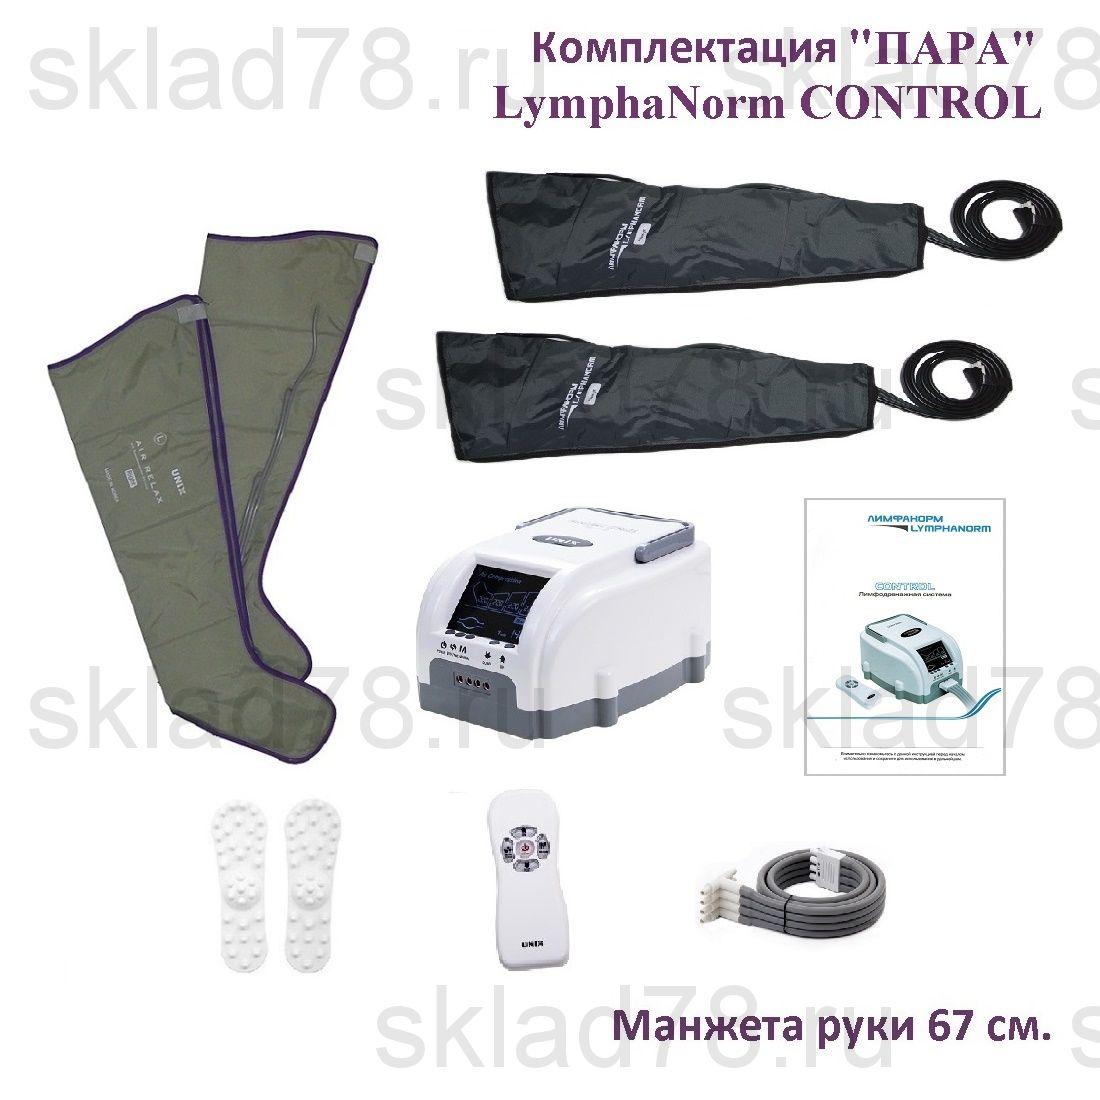 "LymphaNorm CONTROL Лимфодренаж ""ПАРА"" (руки 67 см.)"